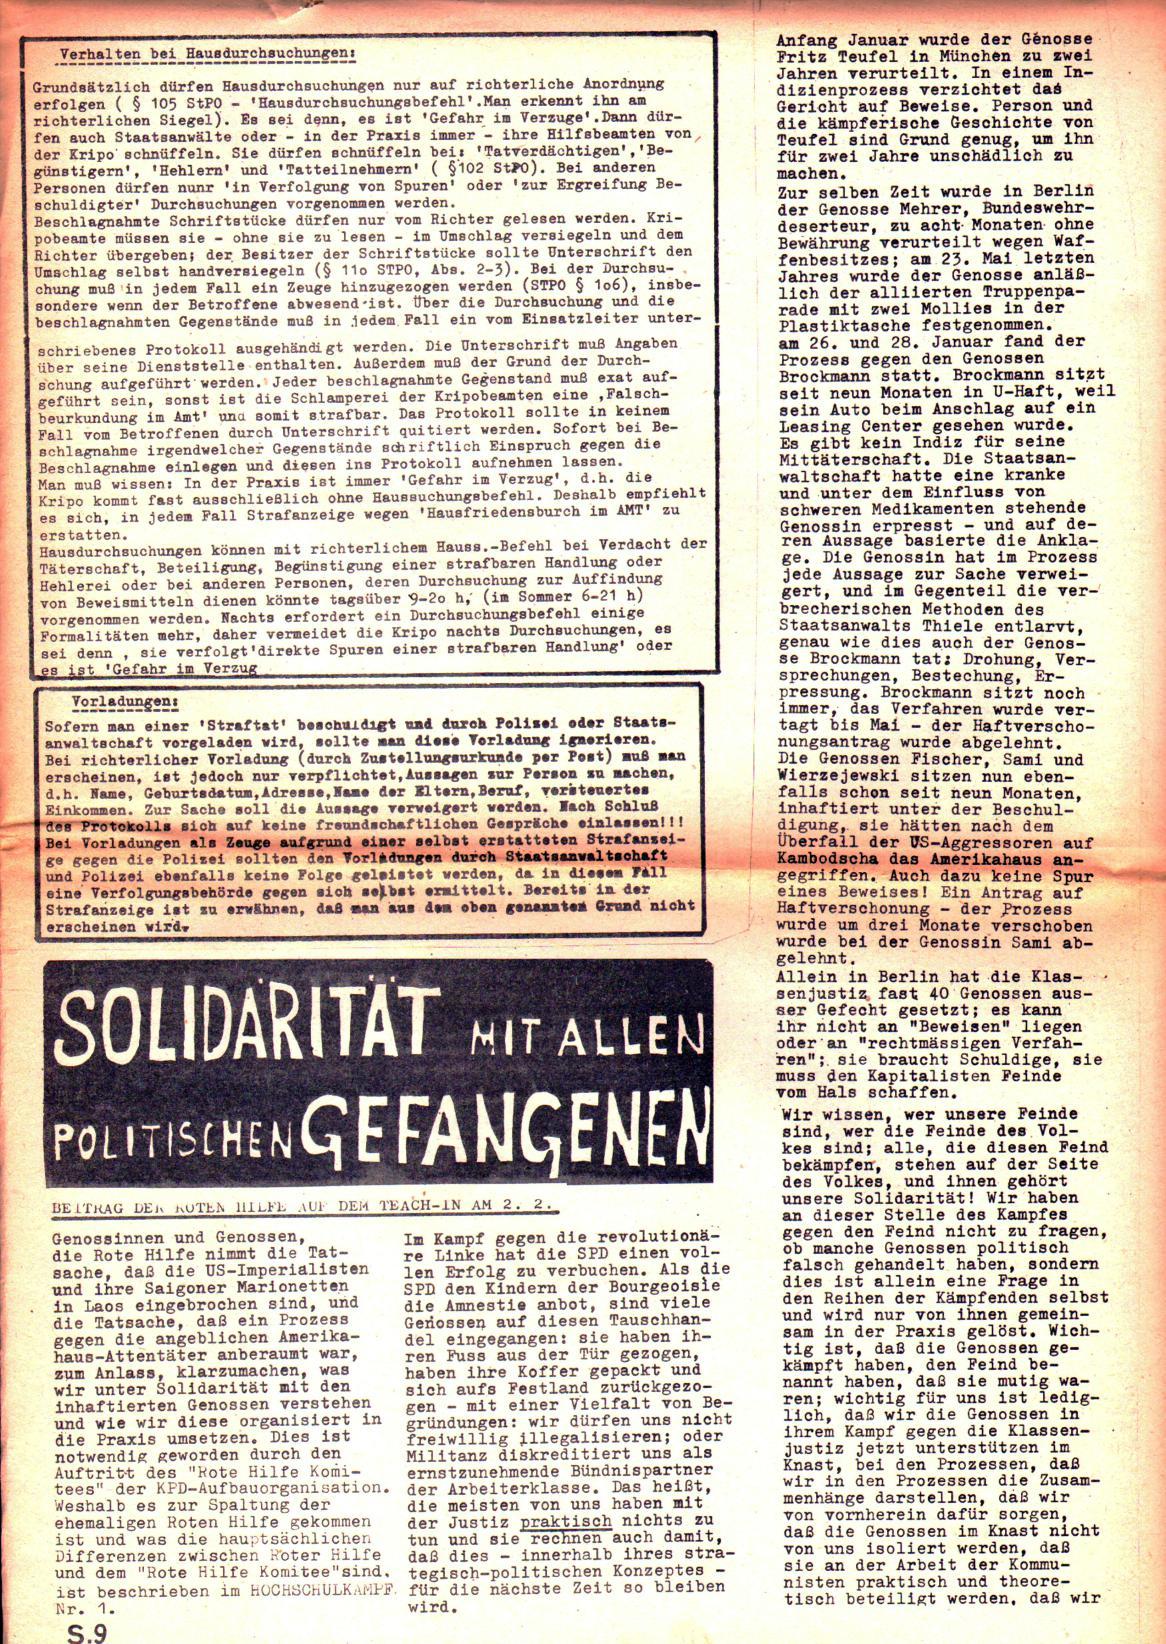 Berlin_Hochschulkampf_1971_02_09